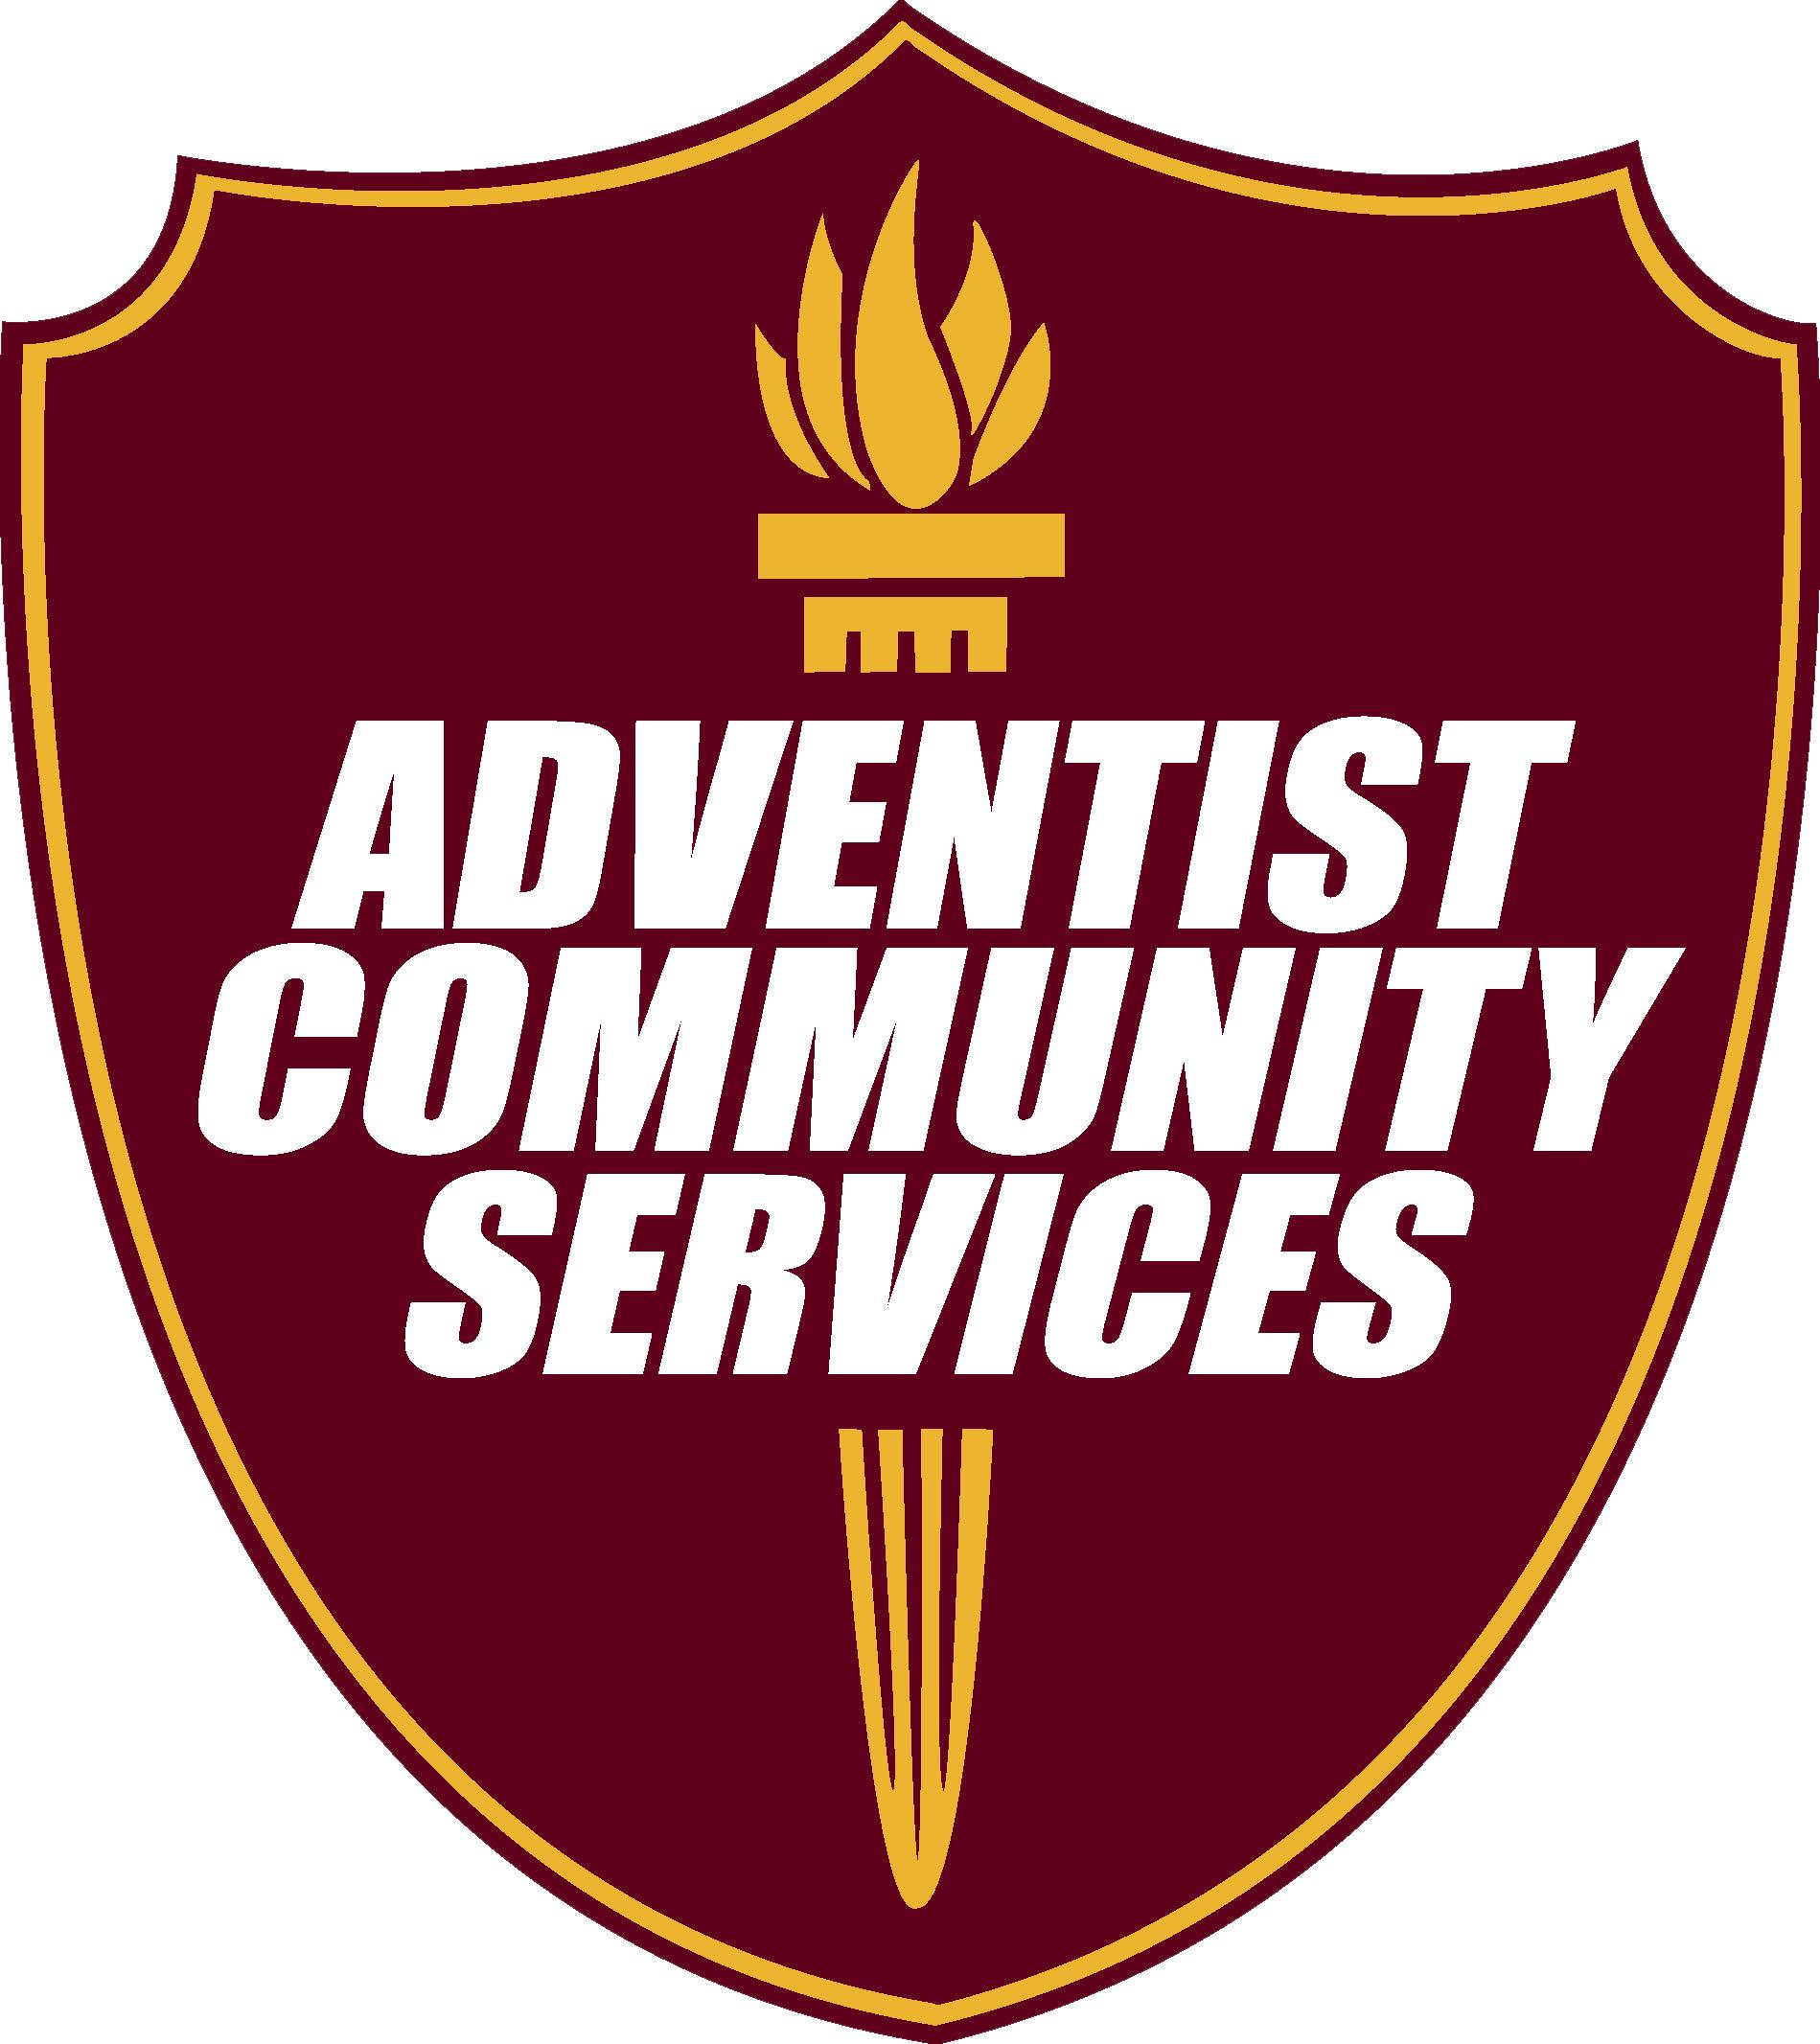 Community services logo.jpg